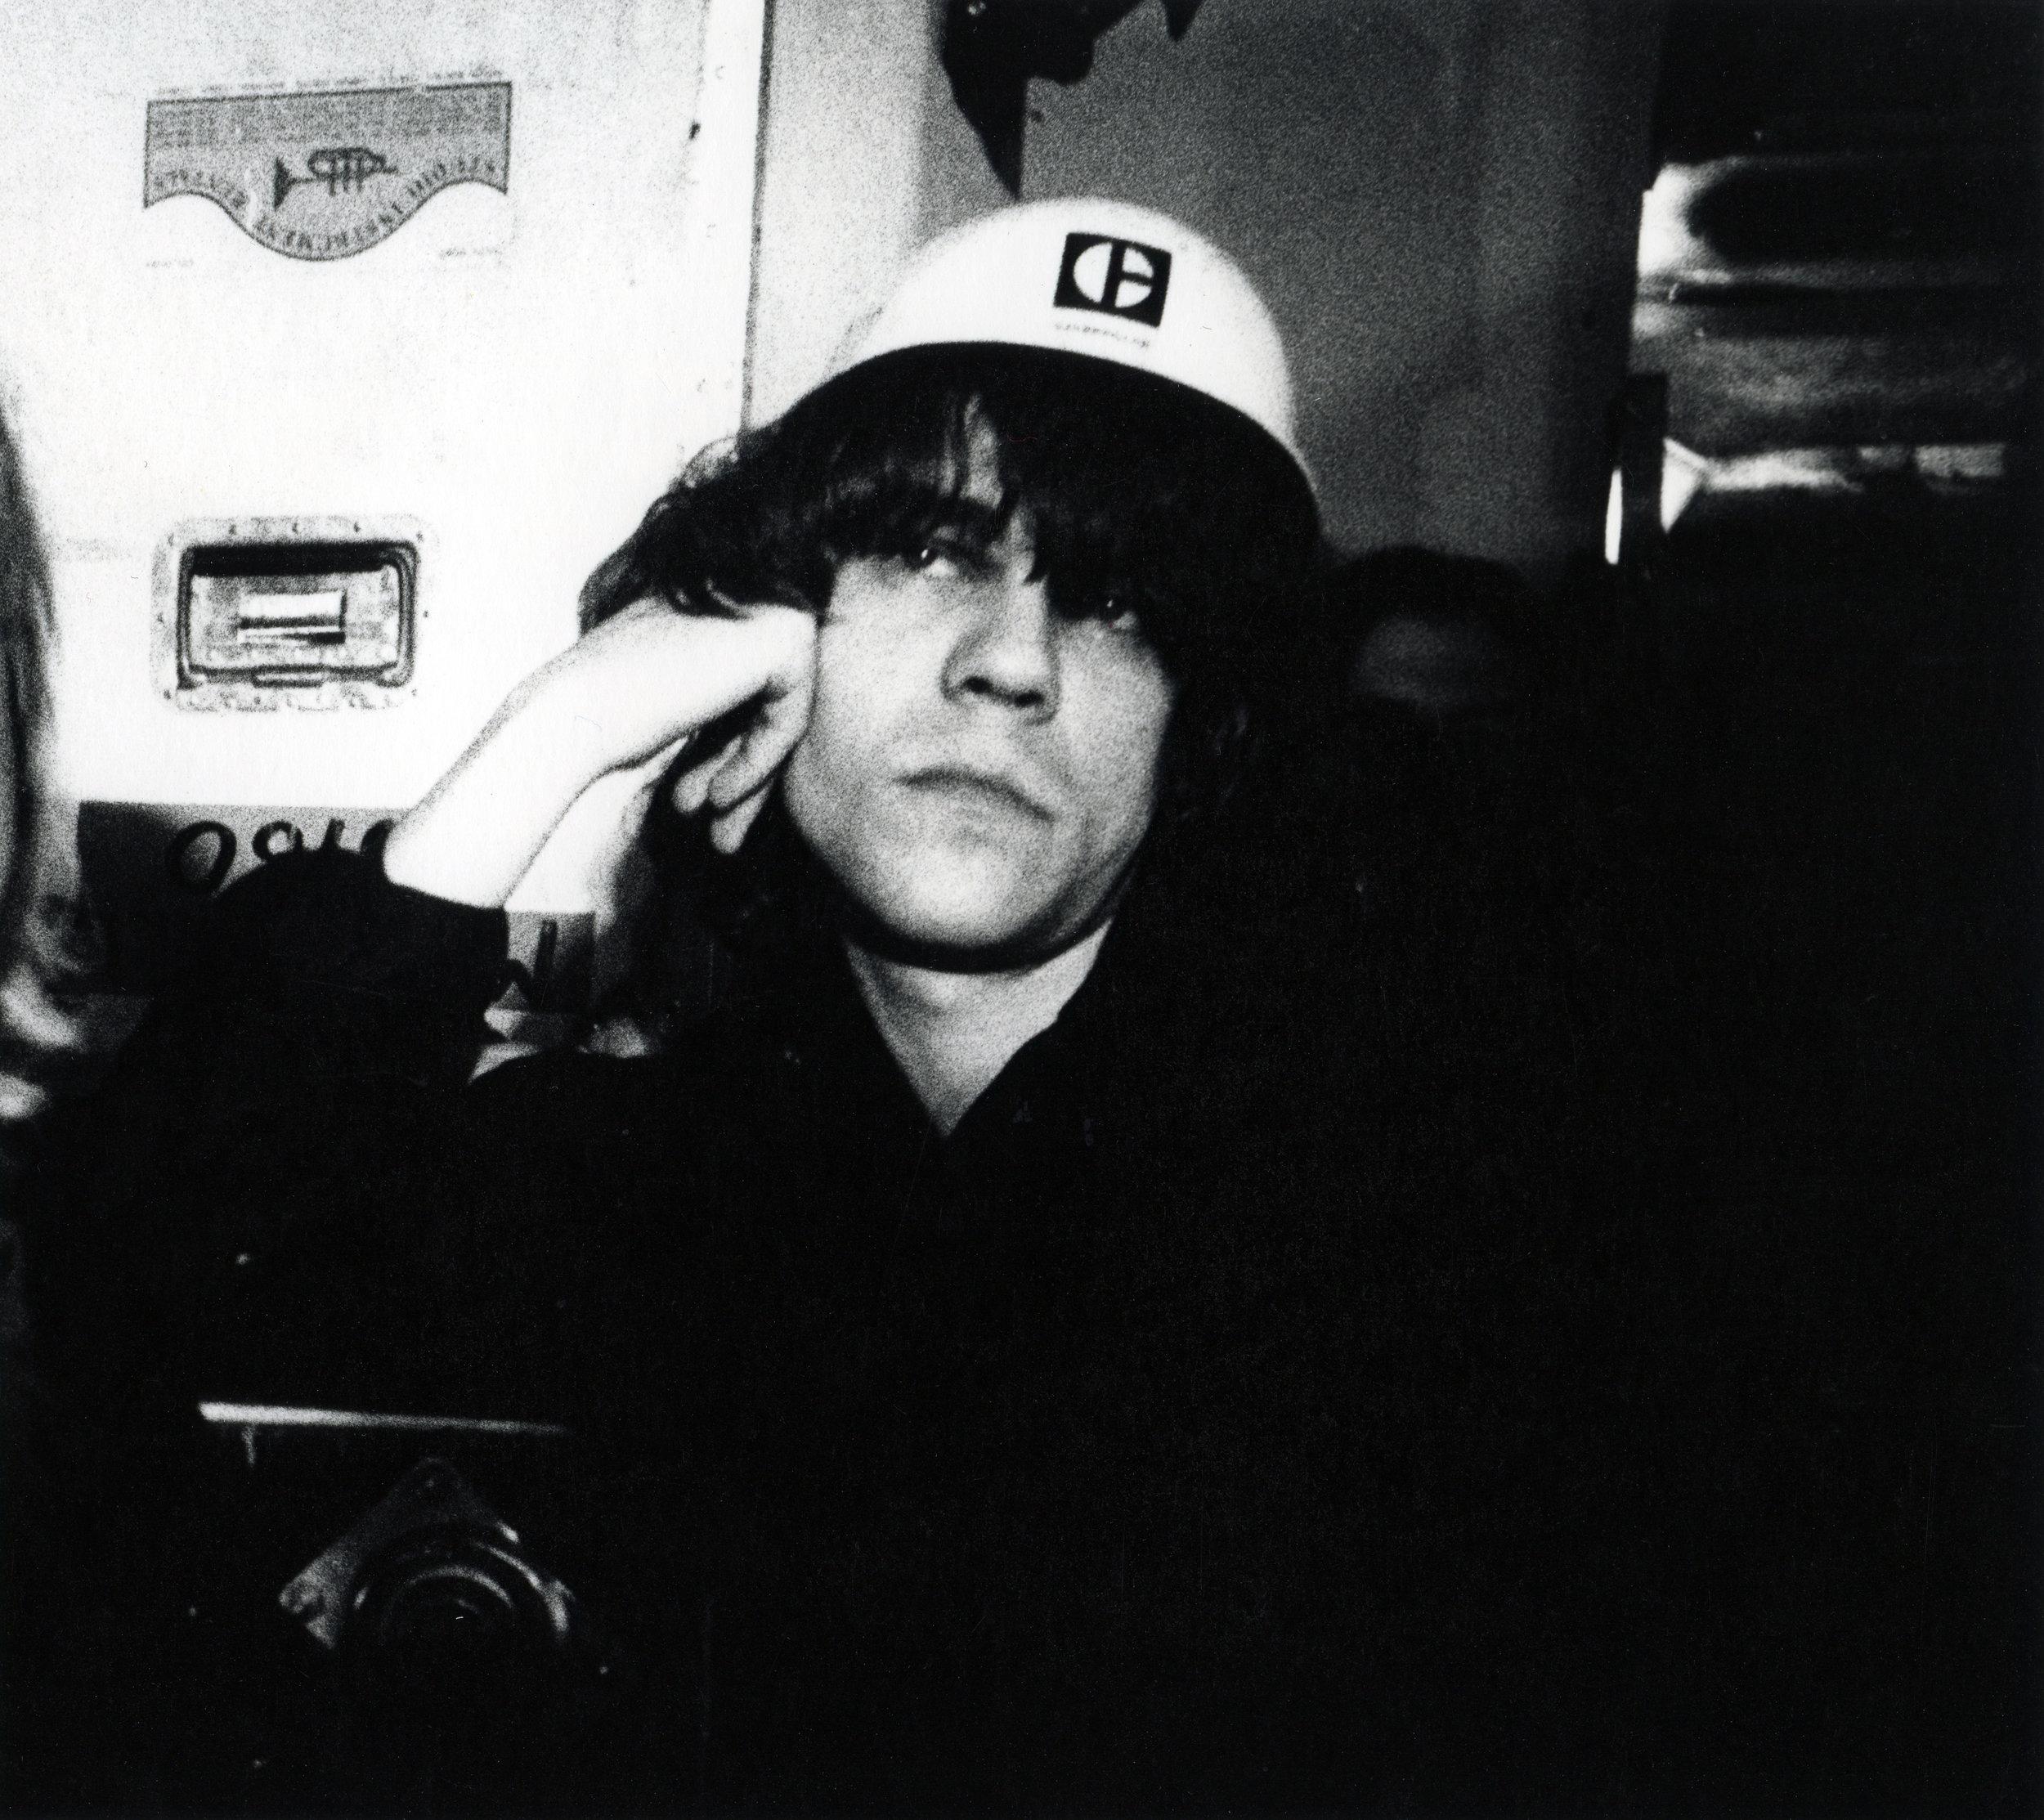 David Johansen, CBGB 1977